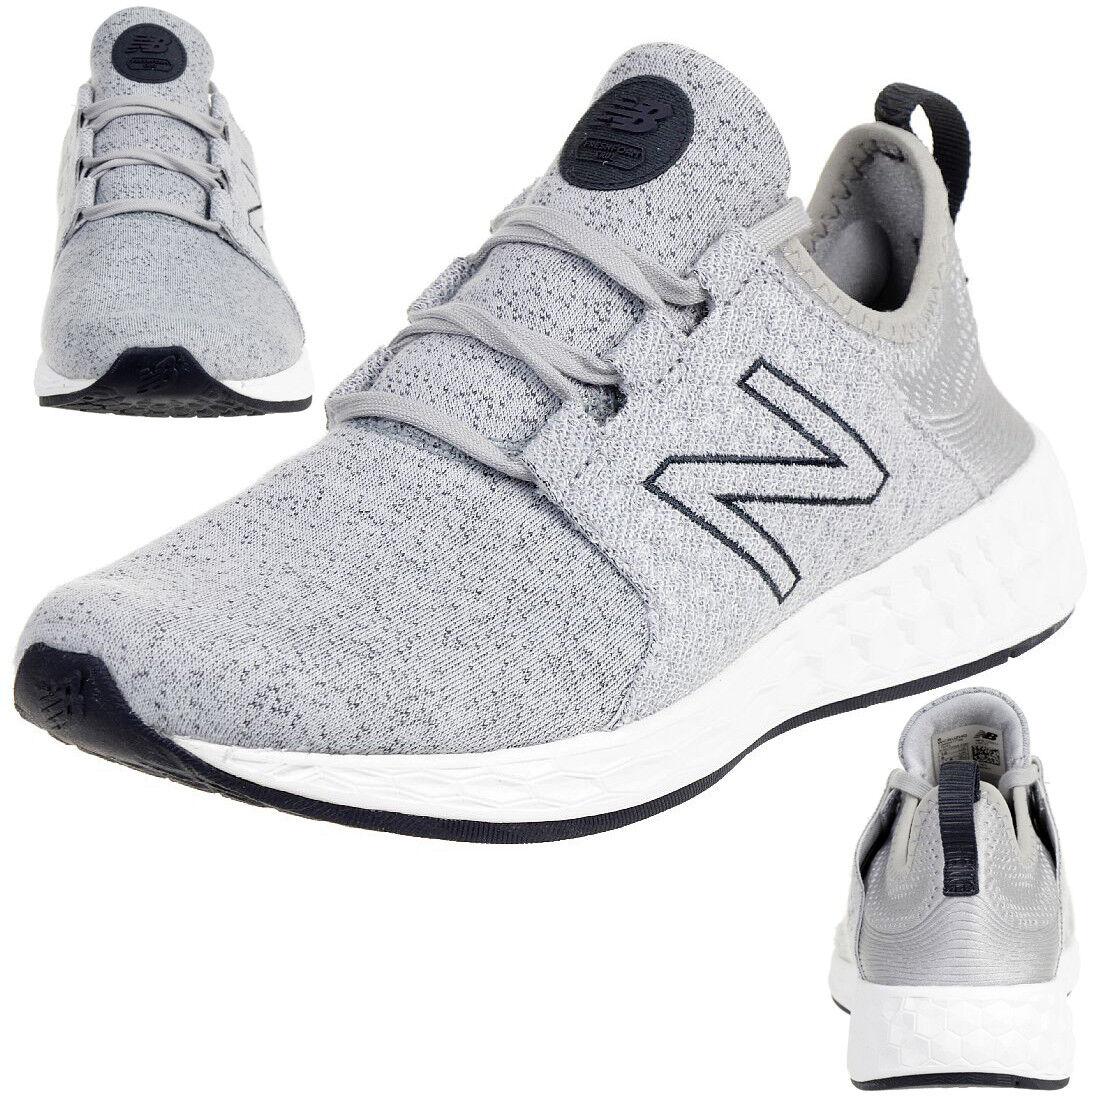 New Balance Fresh Foam Cruz Trainers Running Ladies shoes Grey Wcruzhg